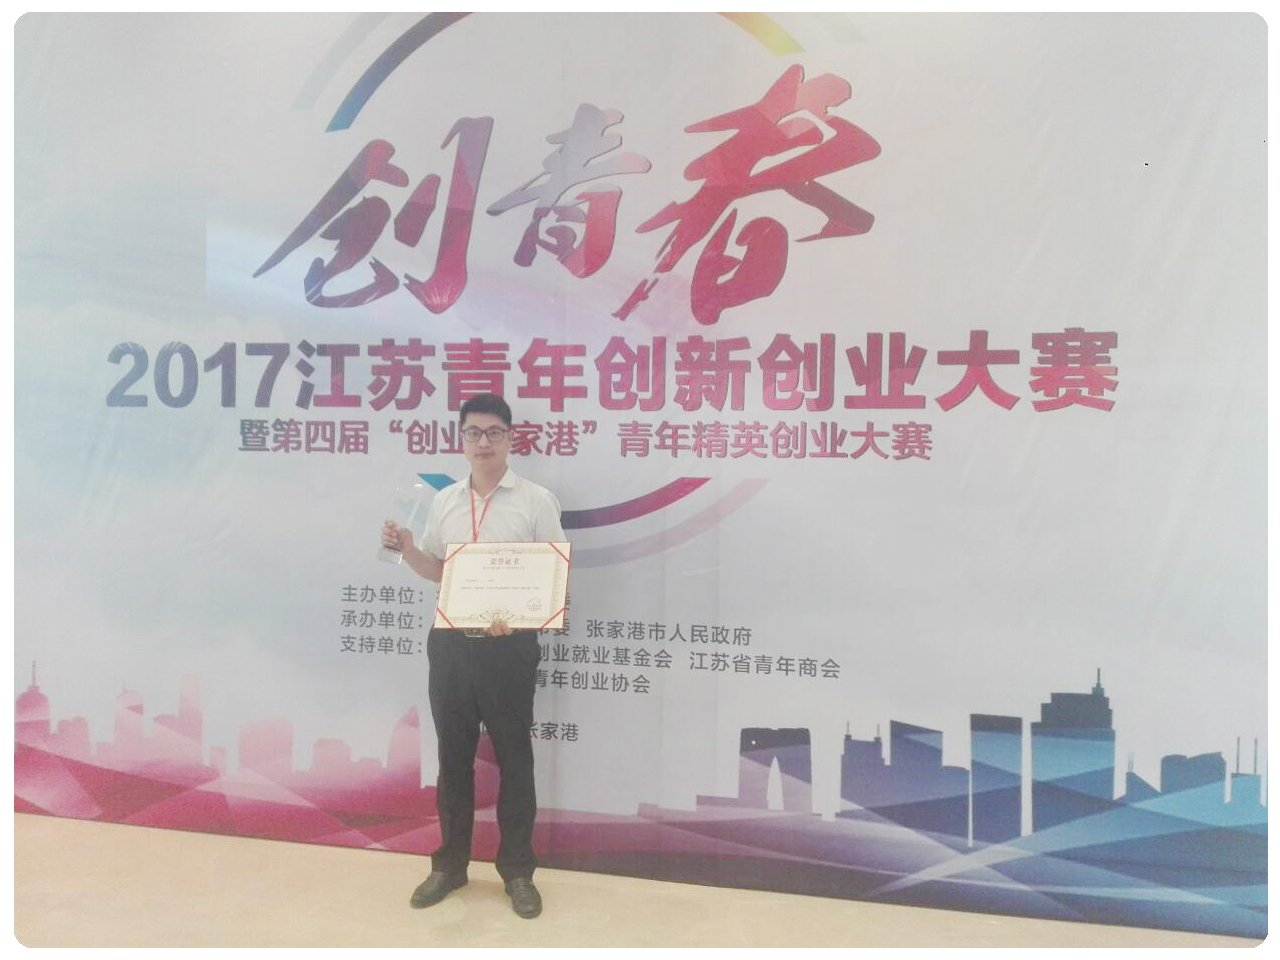 """PEEK型材挤出项目""荣获""2017江苏青年创新创业大赛""三等奖"